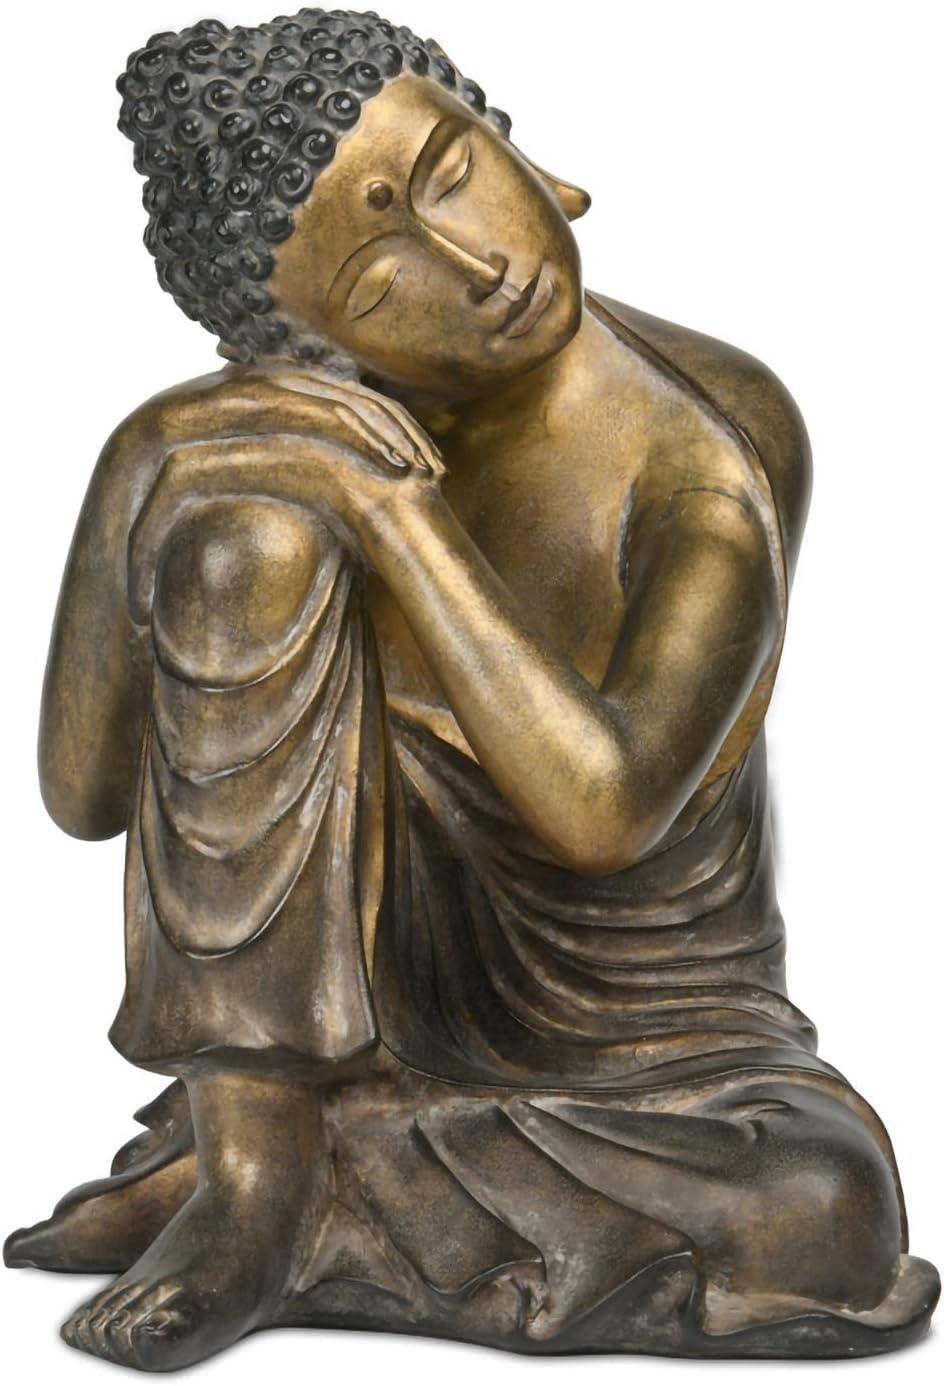 Sleeping Buddha-Statue Decorative Bronze Sitting Meditating Buddha Figurine for Home Garden Decor 8.9L x 8.5W x 12.2H inch-Newman House Studio